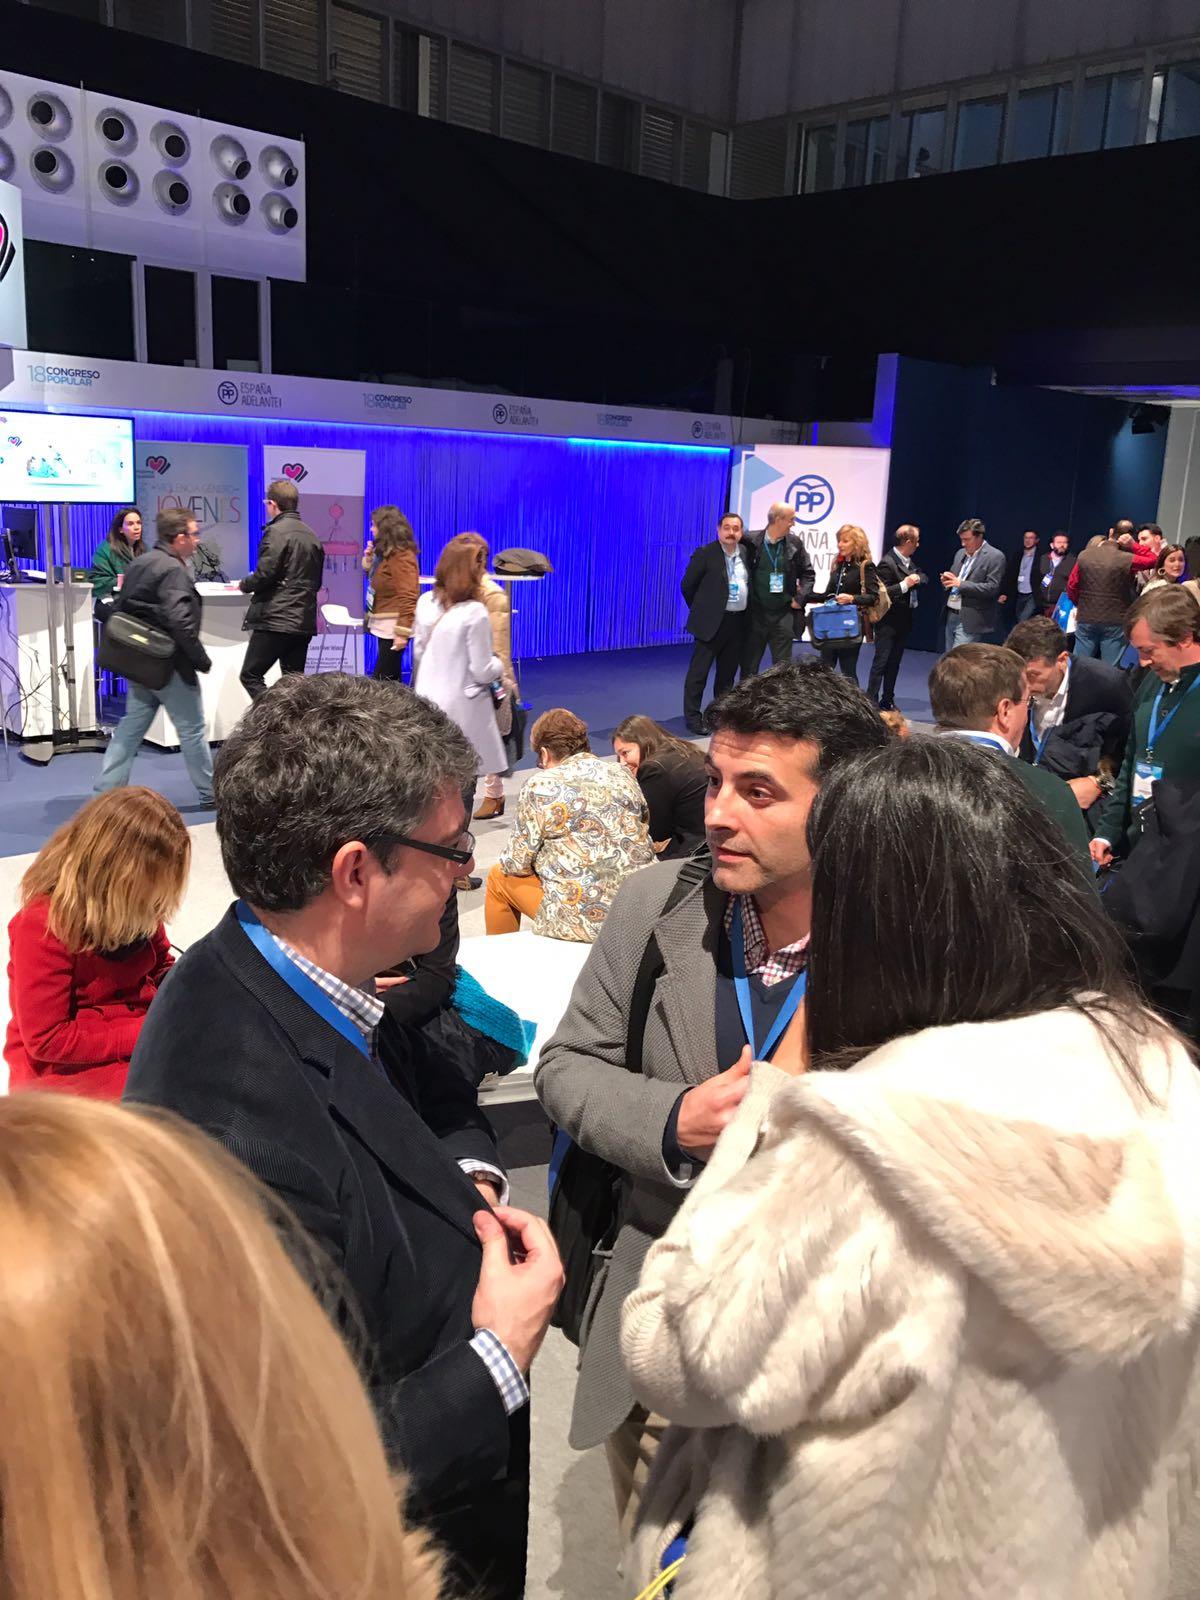 CANGAS DEL NARCEA.- El PP nacional modificará su política minera según Fontaniella